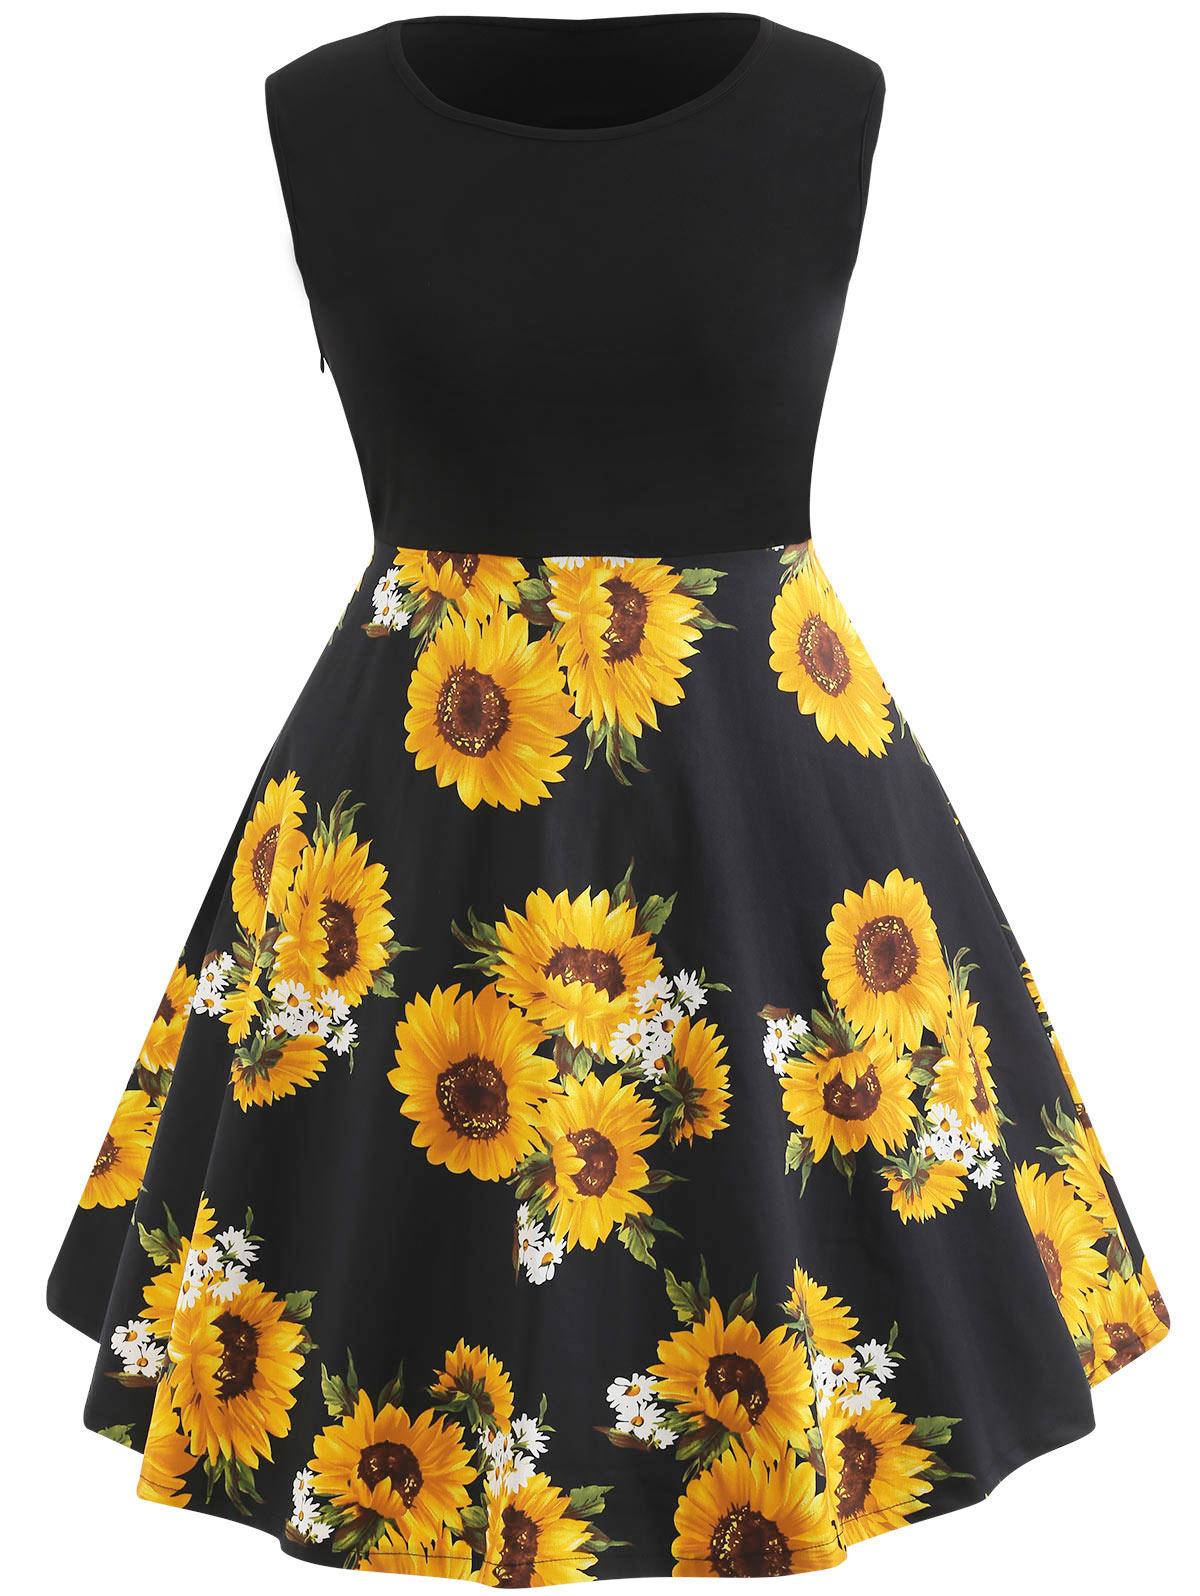 ba5c6a017c59 ... Wipalo Sleeveless Plus Size Sunflower Print Vintage Dress Patchwork  Casual Black Dress Women A Line Floral ...